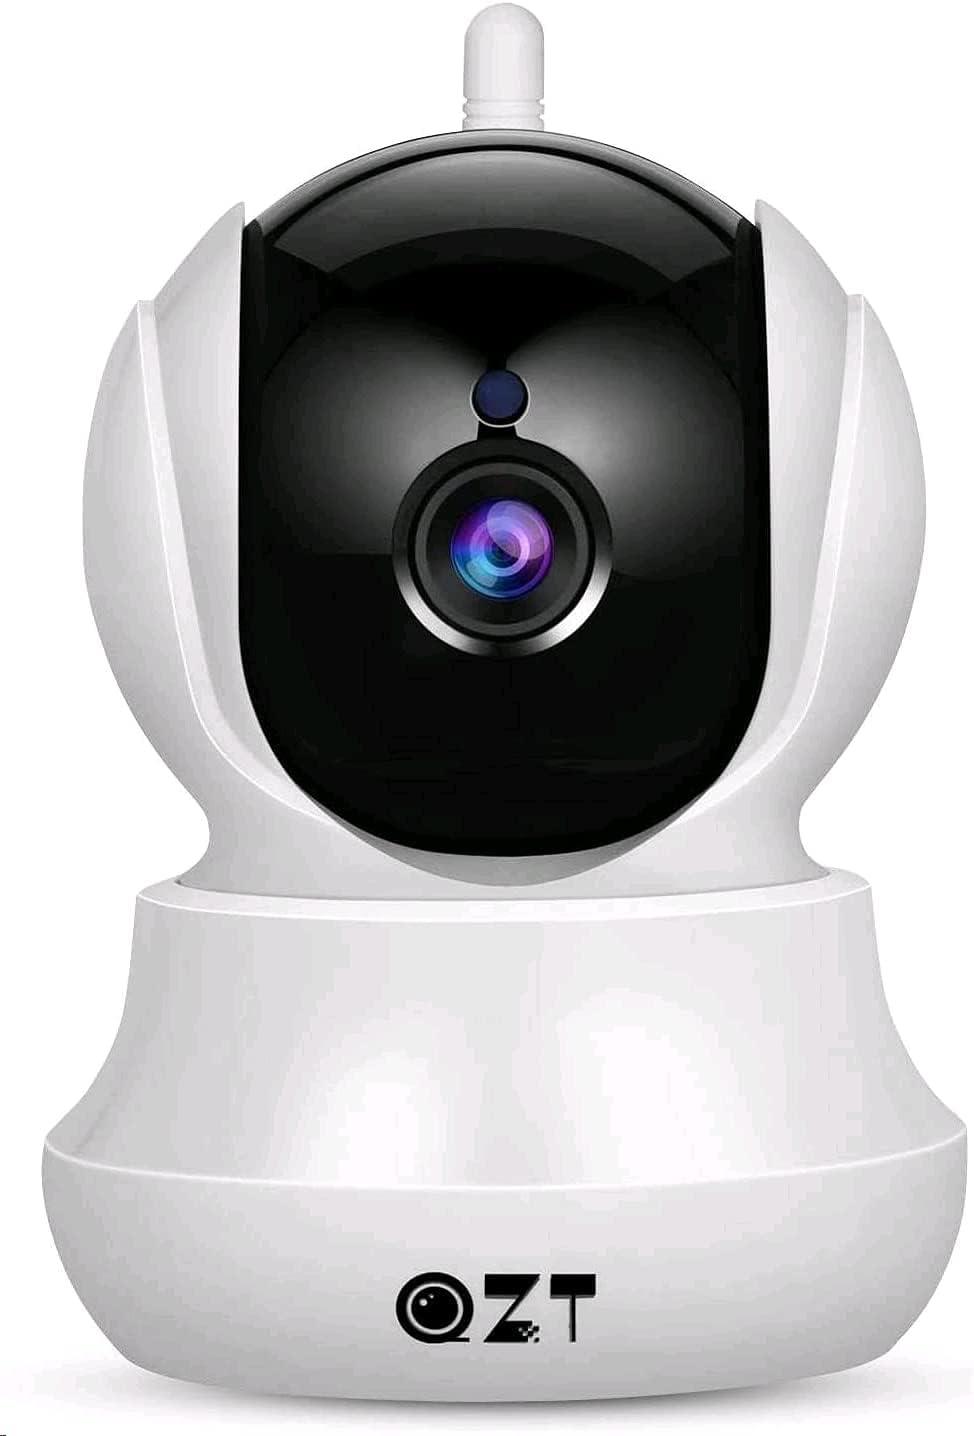 Cámara de Vigilancia QZT 1080P WiFi